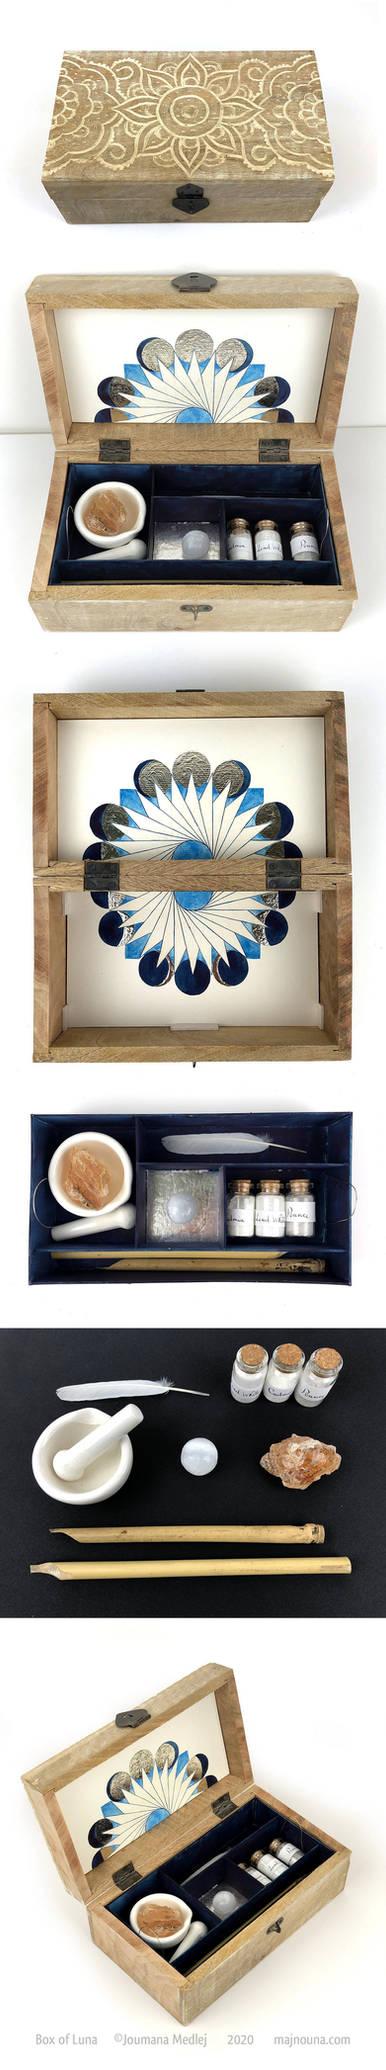 Box of Luna